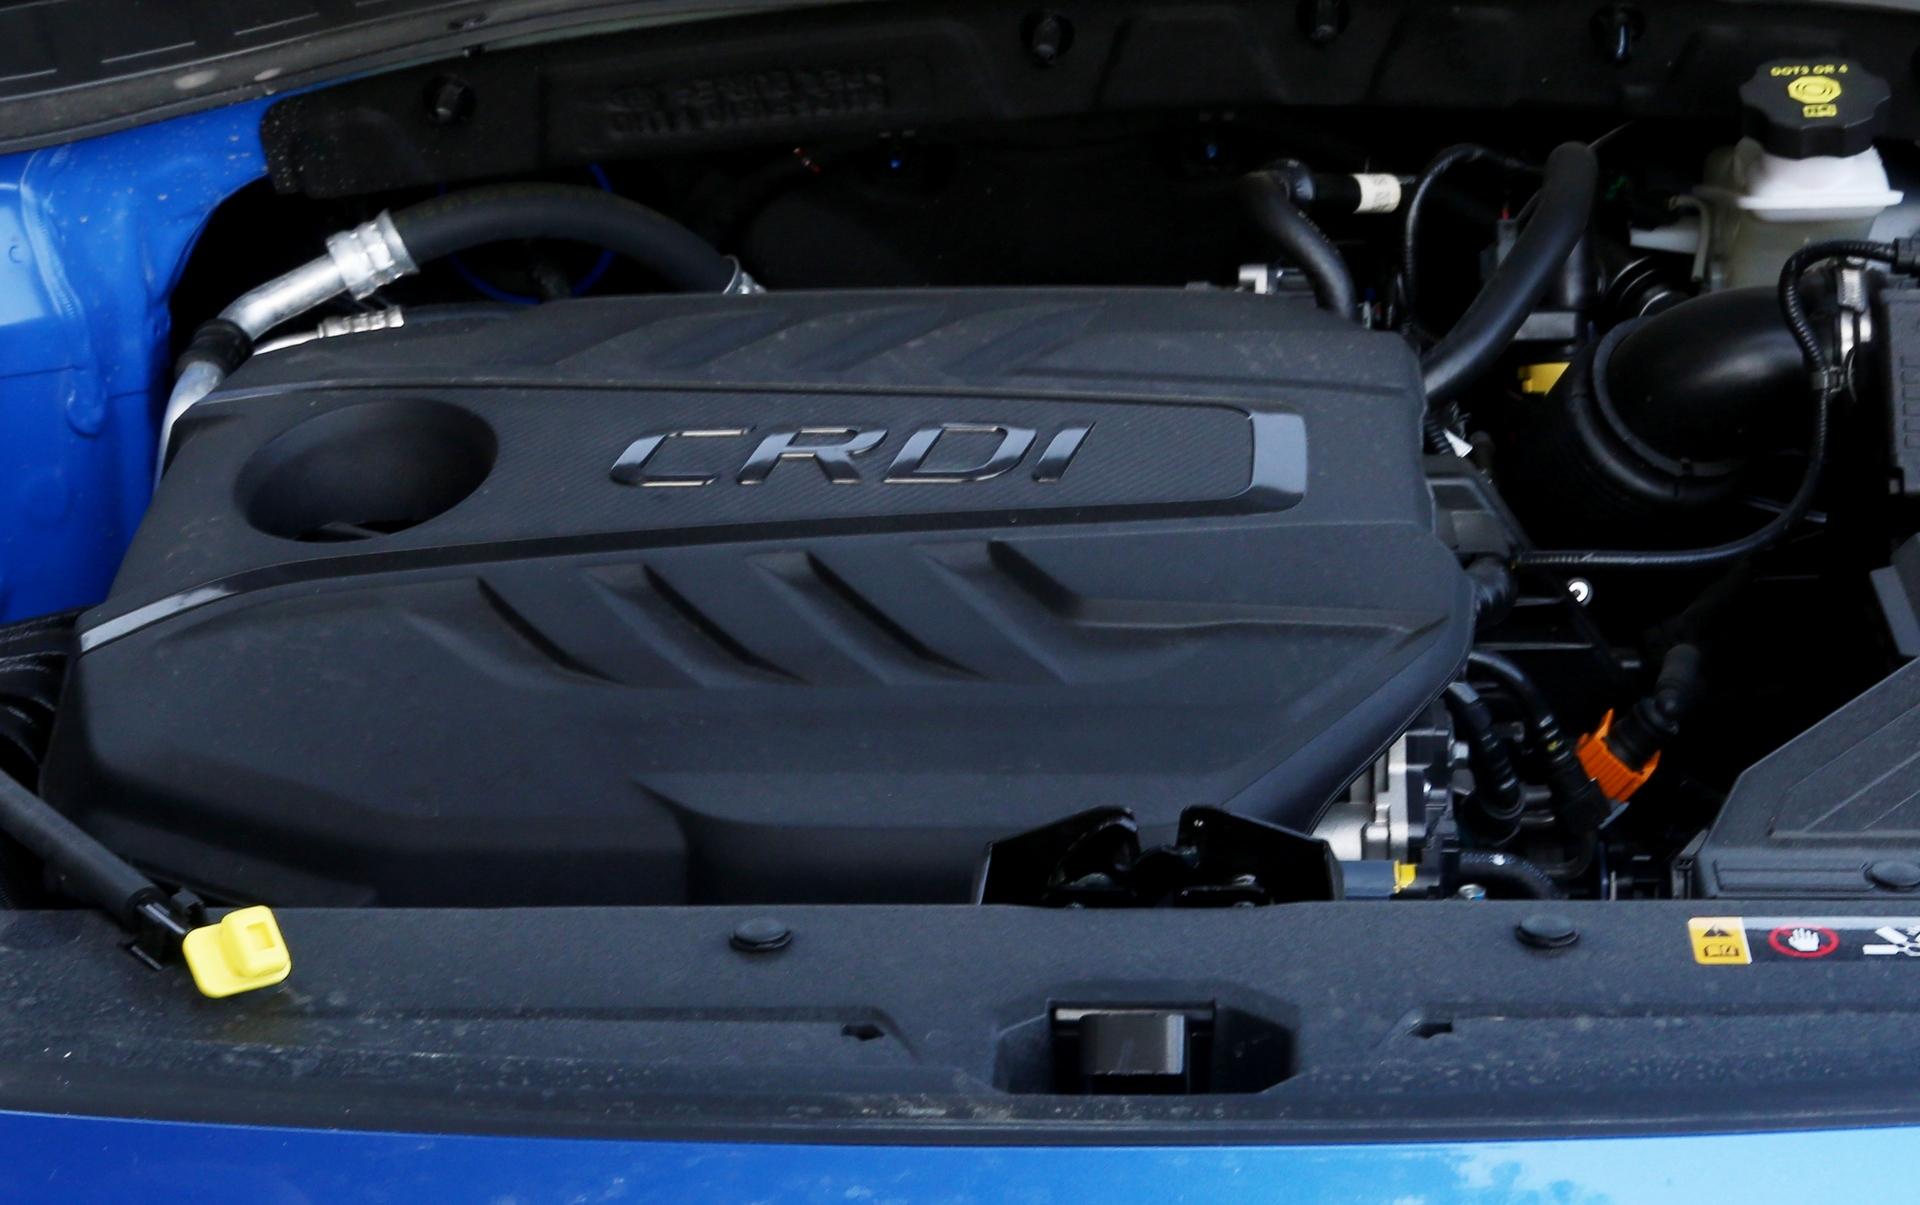 Kia Sportage 1.6D 136 PS 4WD DCT 48V Hybrid